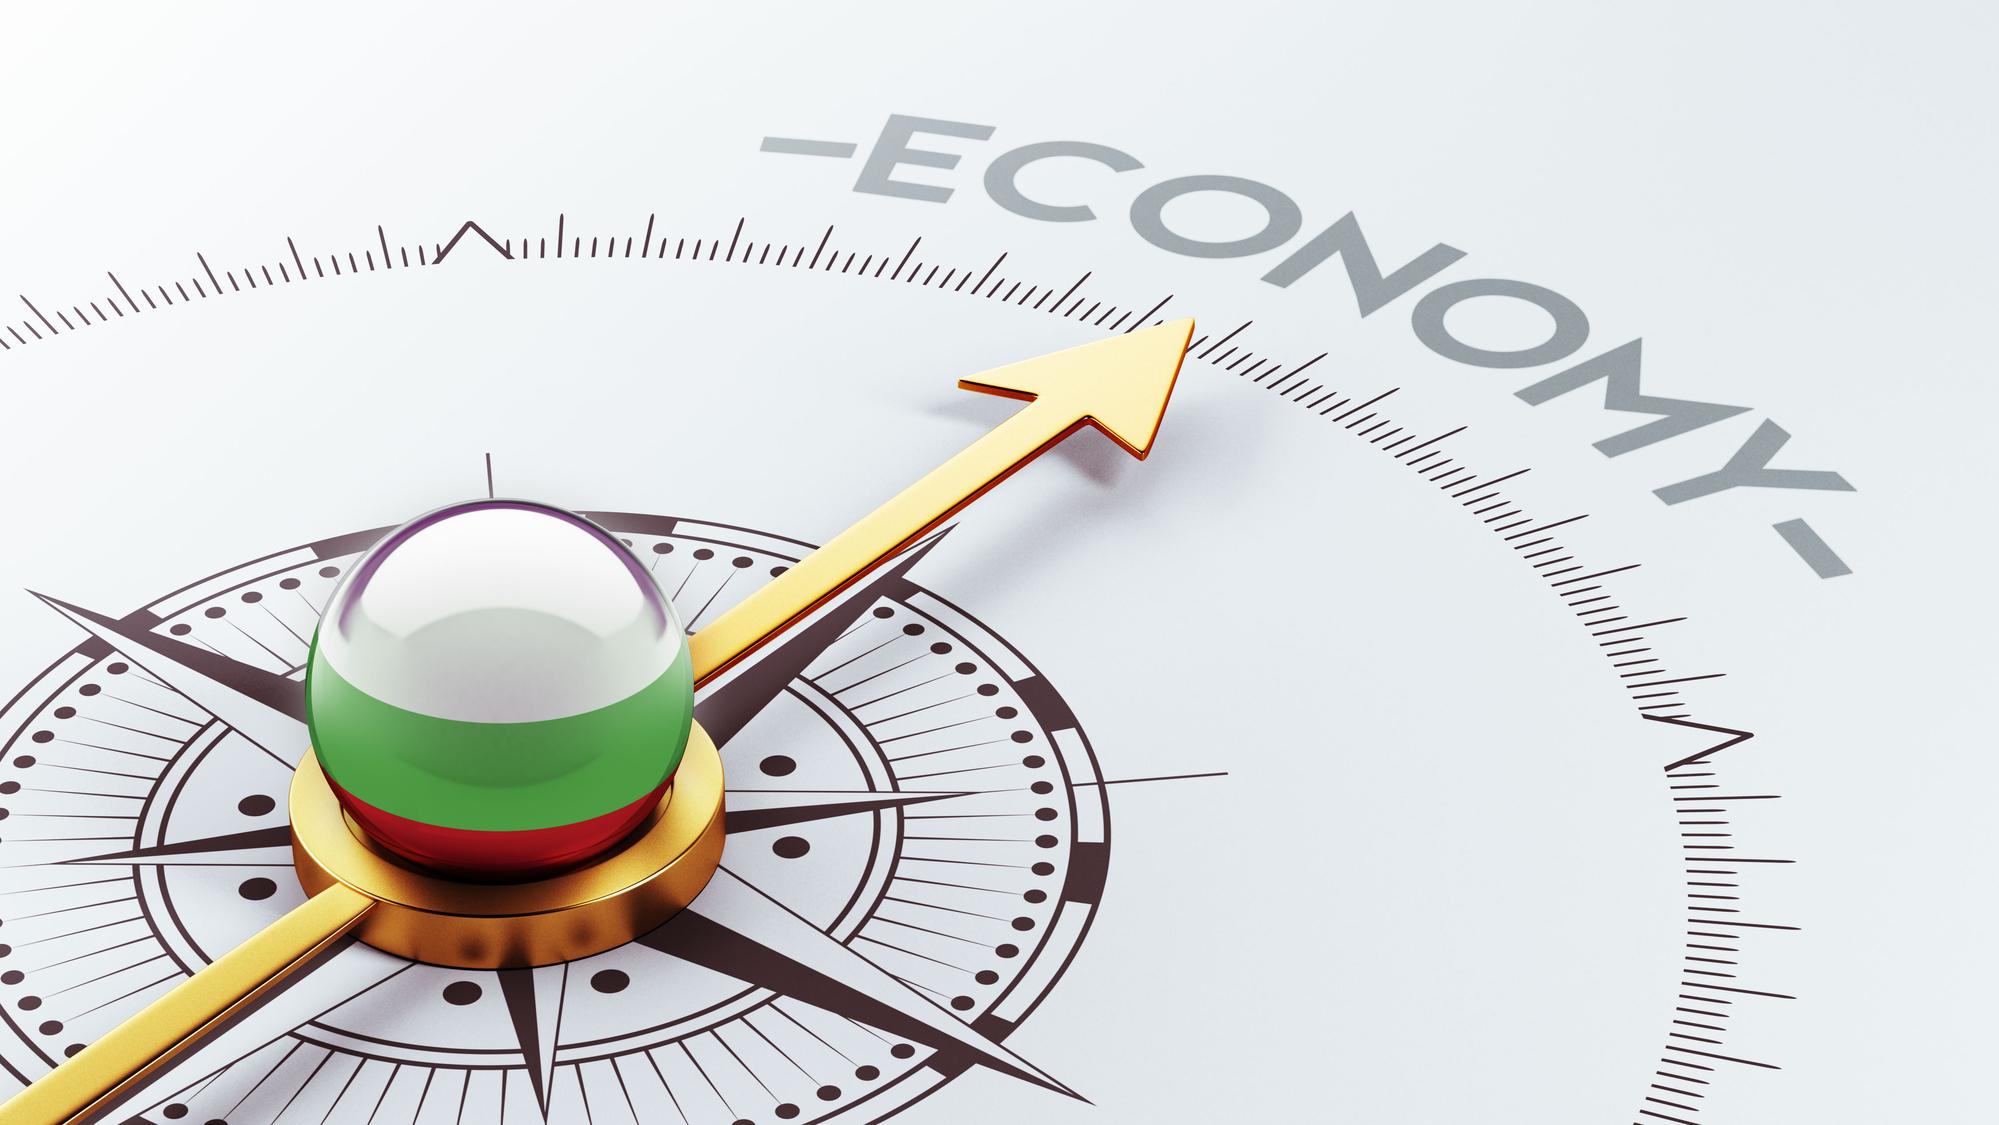 nuova economia ecologica